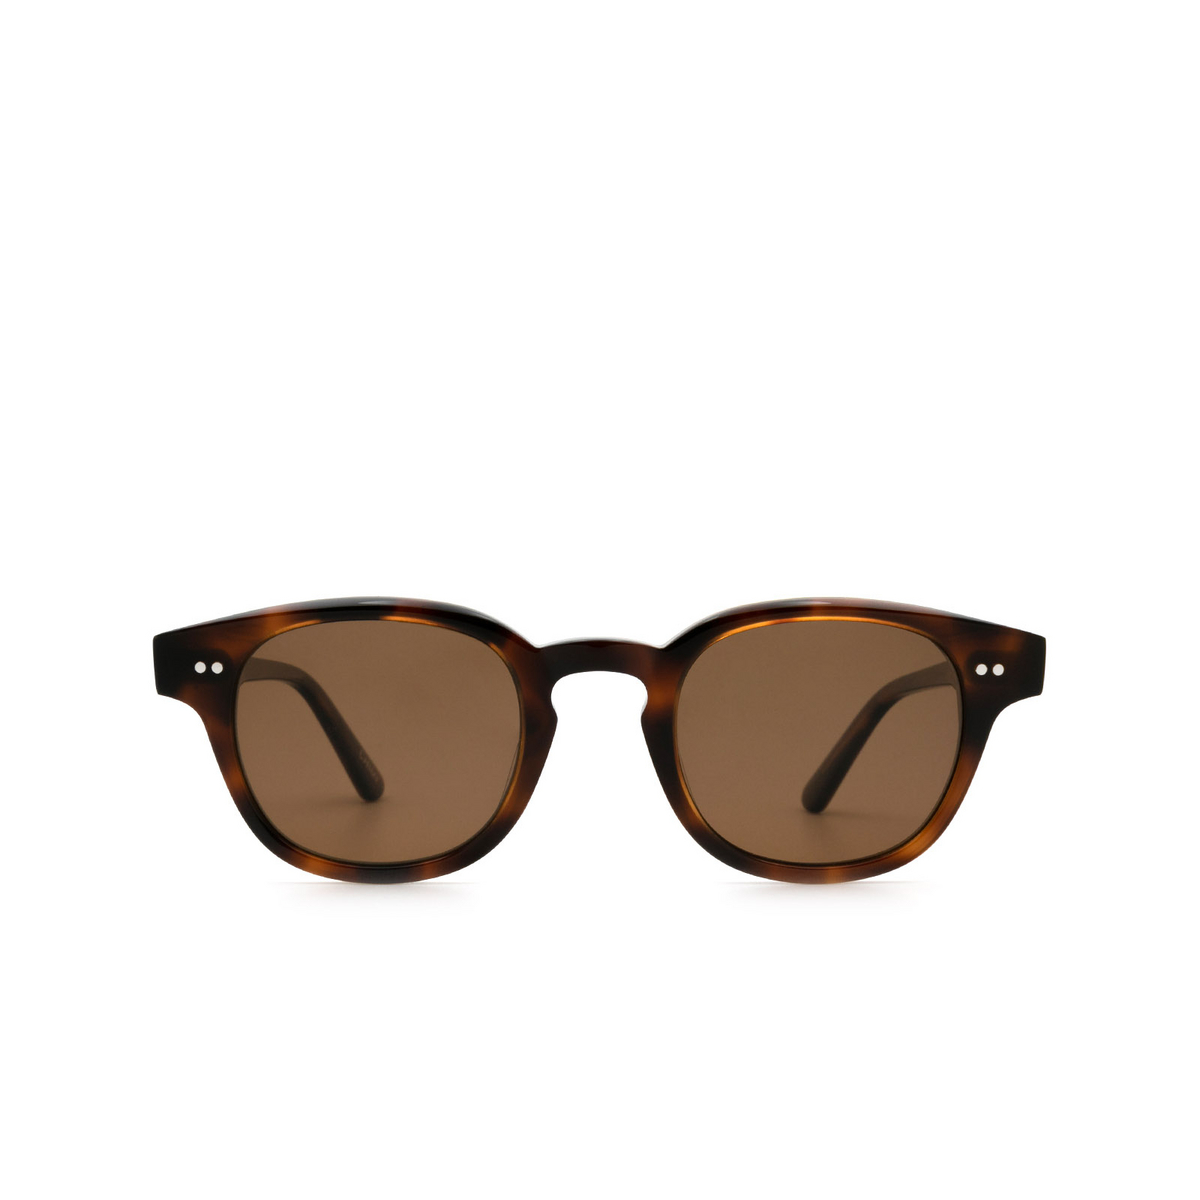 Chimi® Square Sunglasses: 01 color Tortoise - front view.